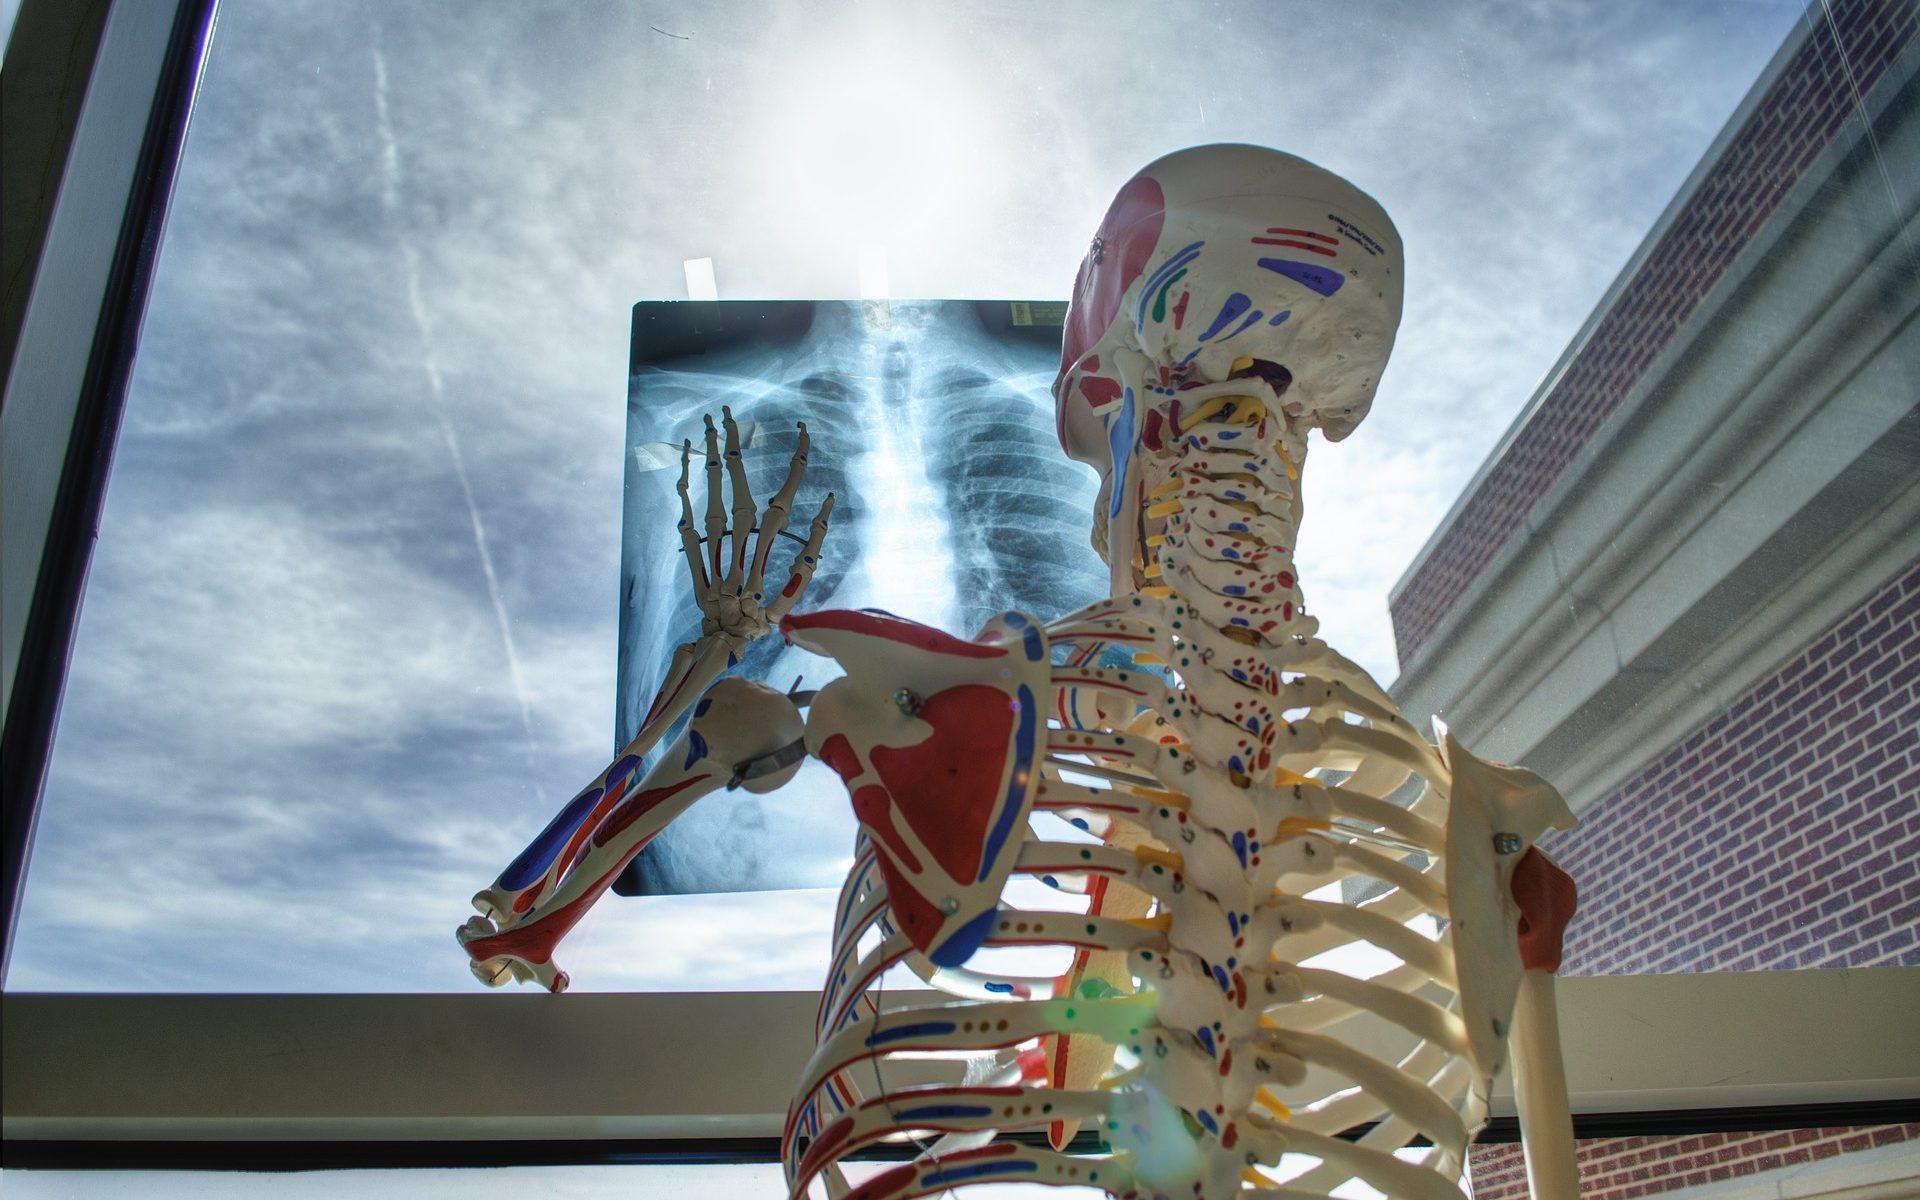 https://pixabay.com/de/skelett-medizinische-technologie-2561573/